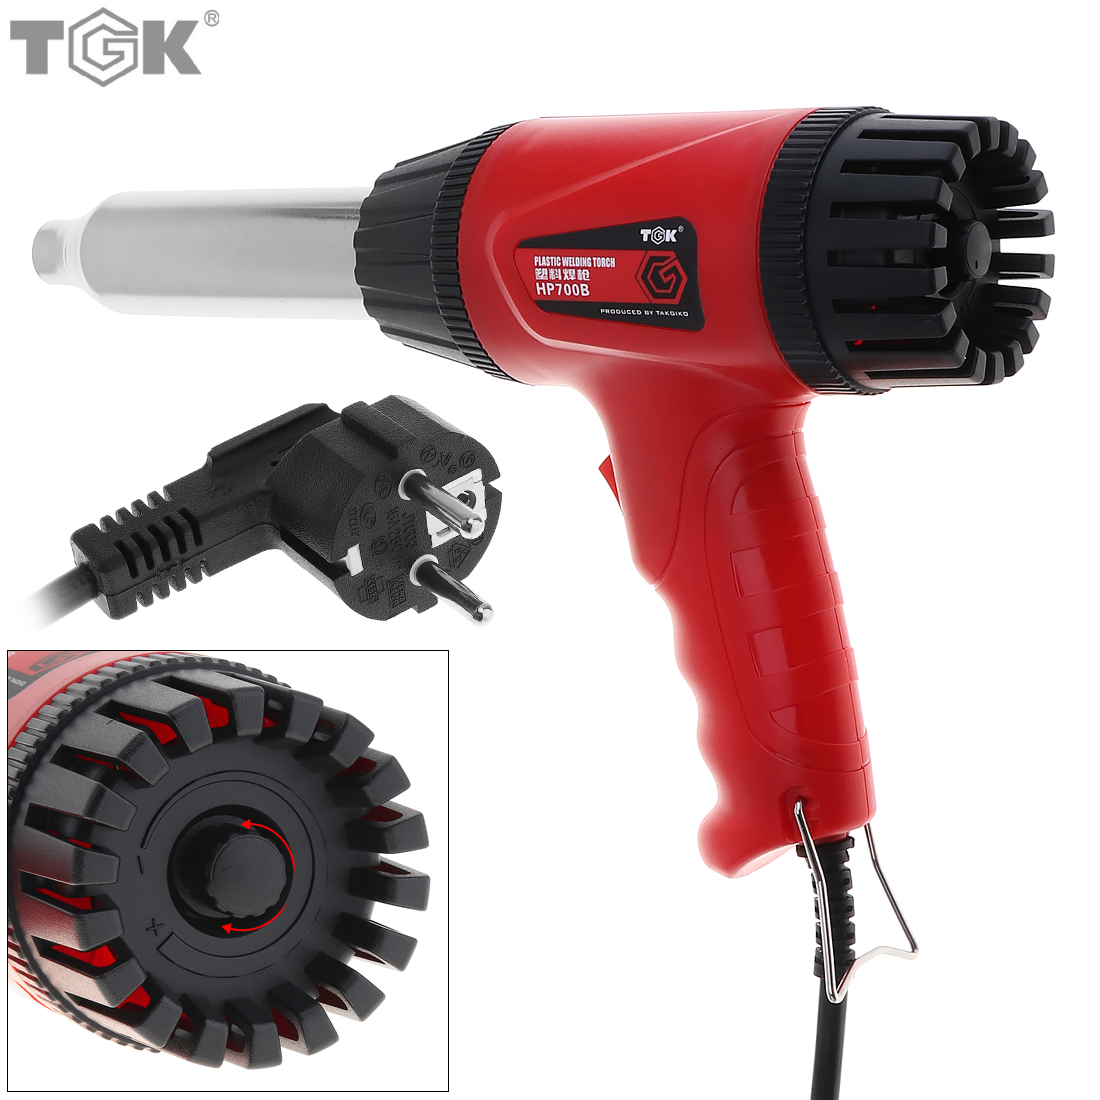 цена на TGK HP700B 220V 700W Temperature Adjustable Heat Gun Hot-air Gun Hand Hold with Control Button for Softening Soldering/ Welding